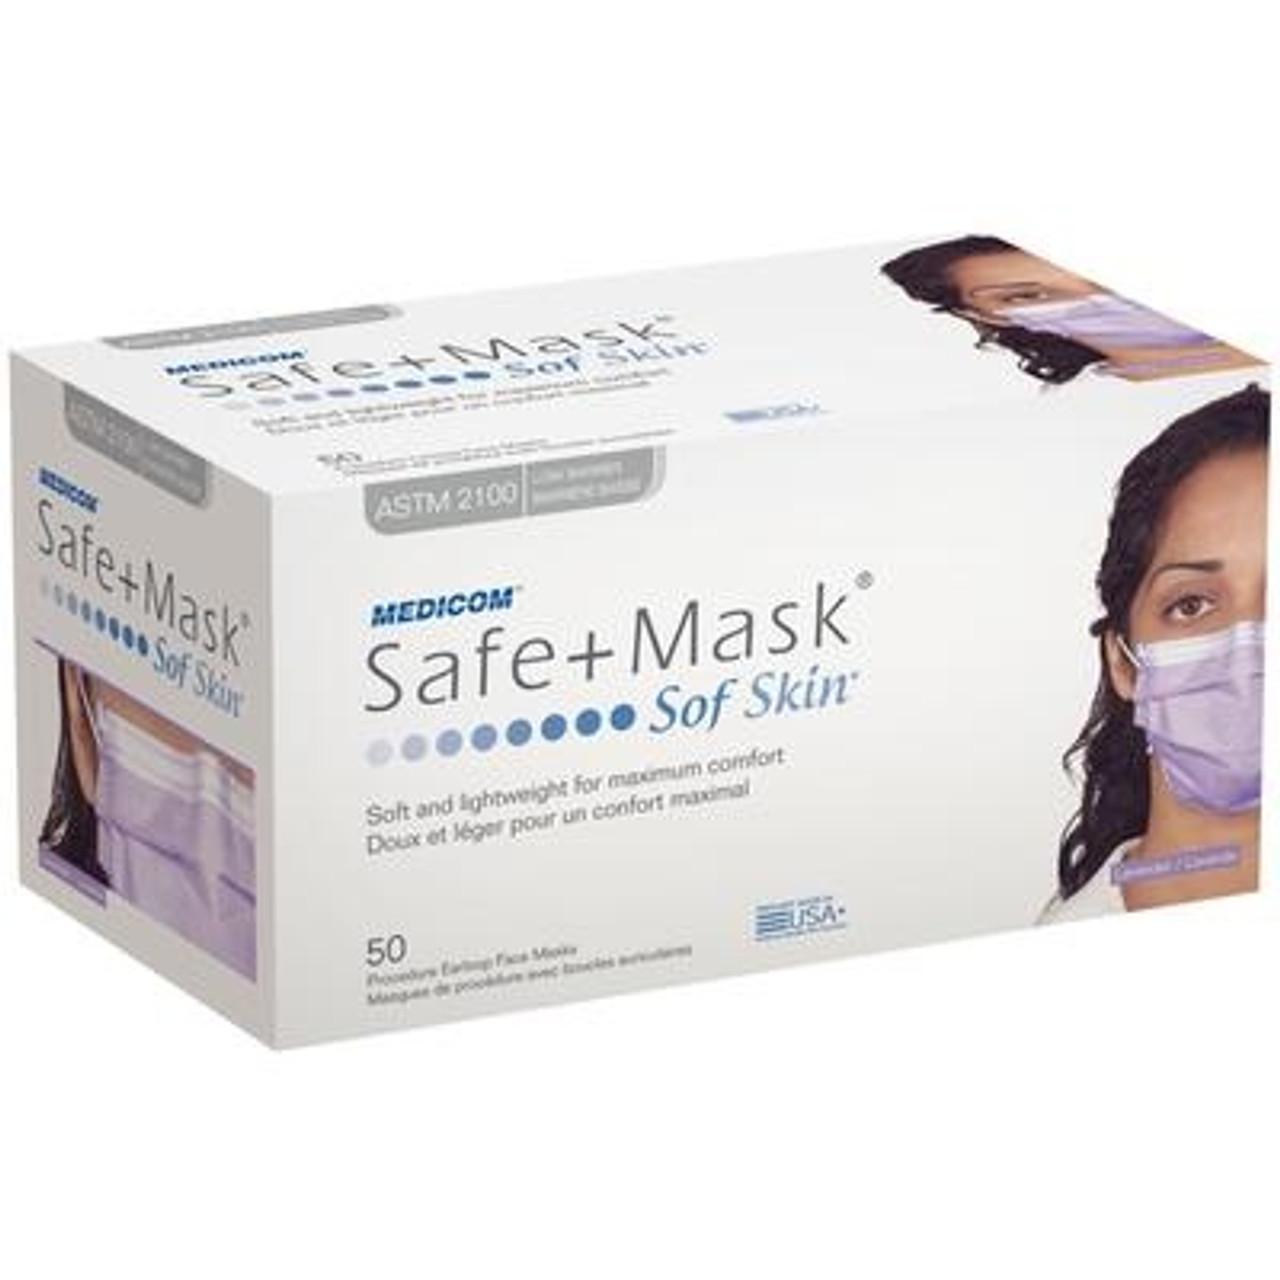 medicom surgical mask level 3